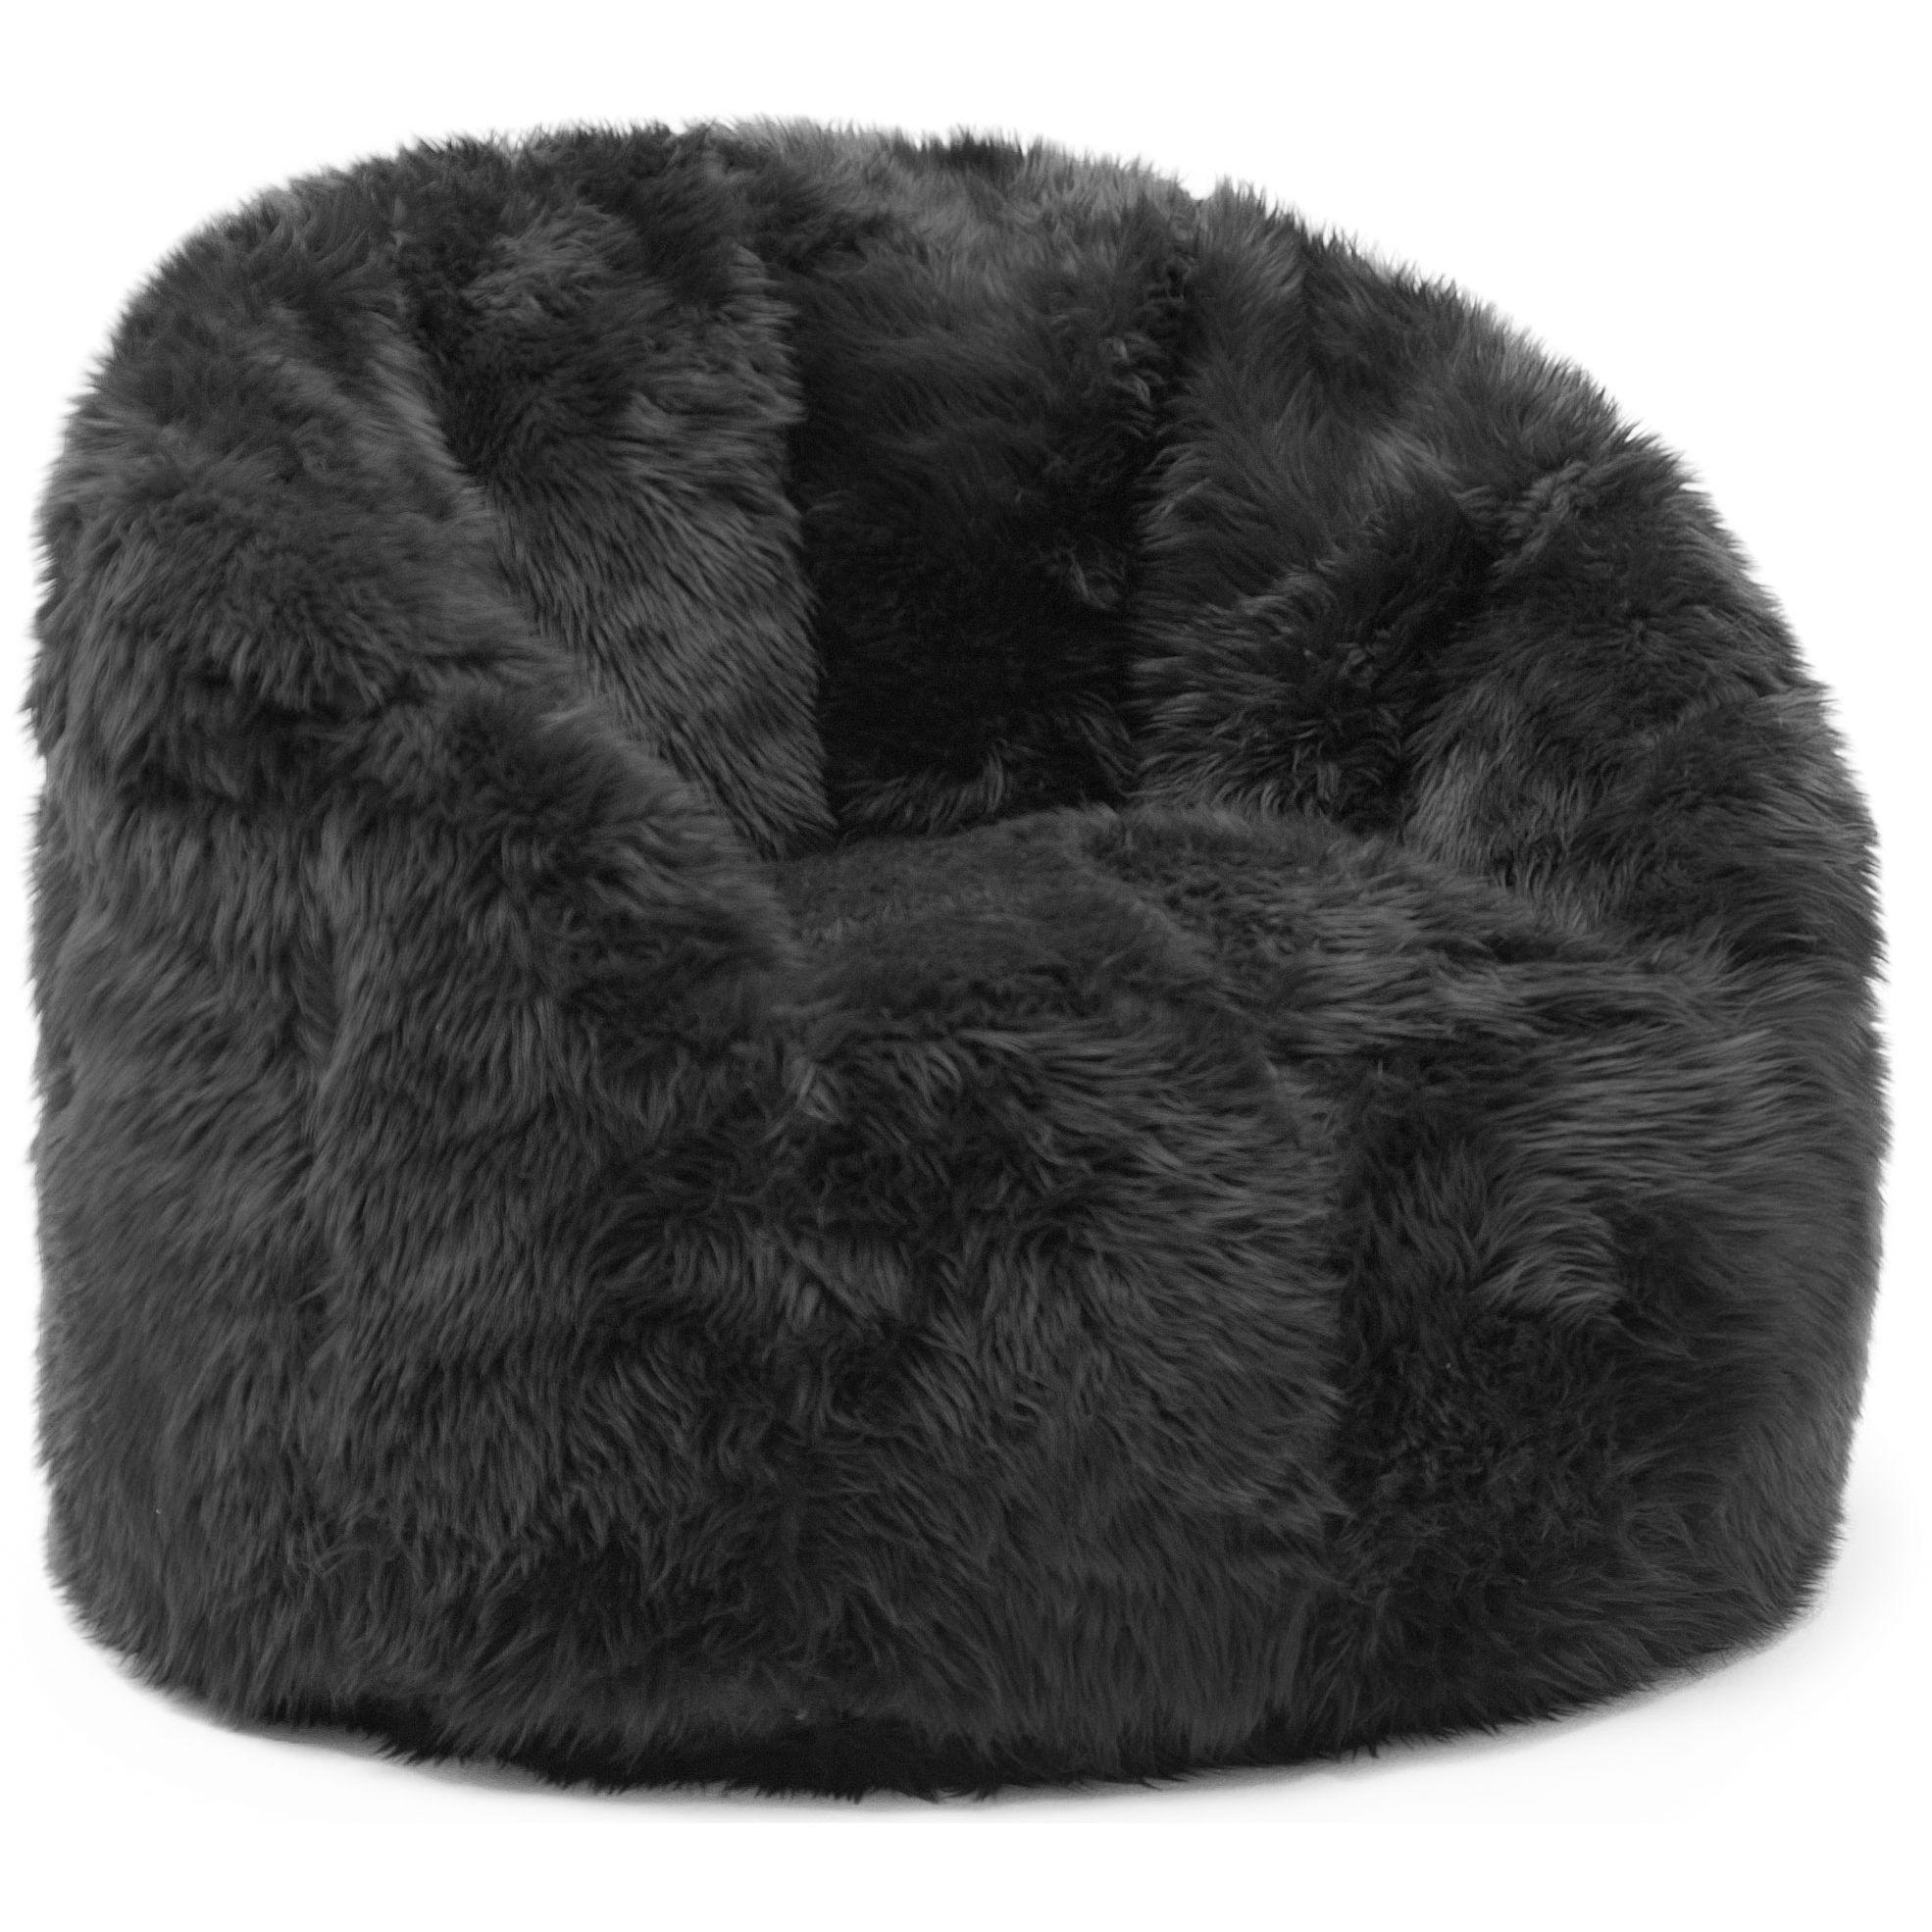 eed9adb64b Comfort Research BeanSack Big Joe Milano Faux Fur Bean Bag Chair (Black Faux  Fur)